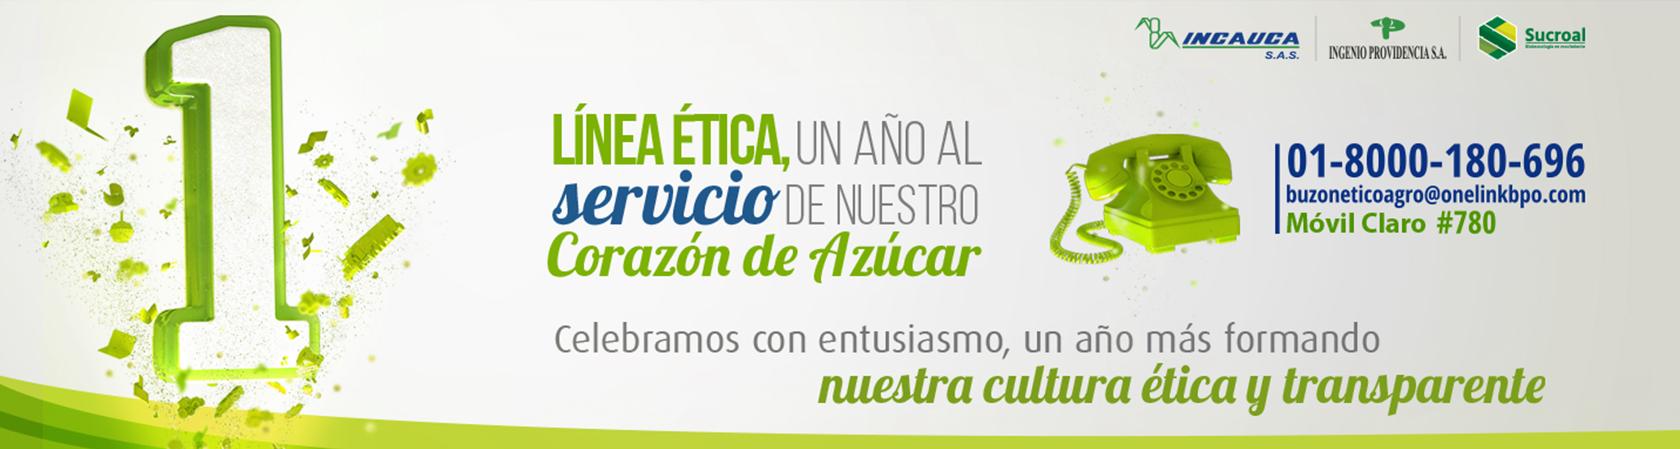 linea-etica_incauca_en